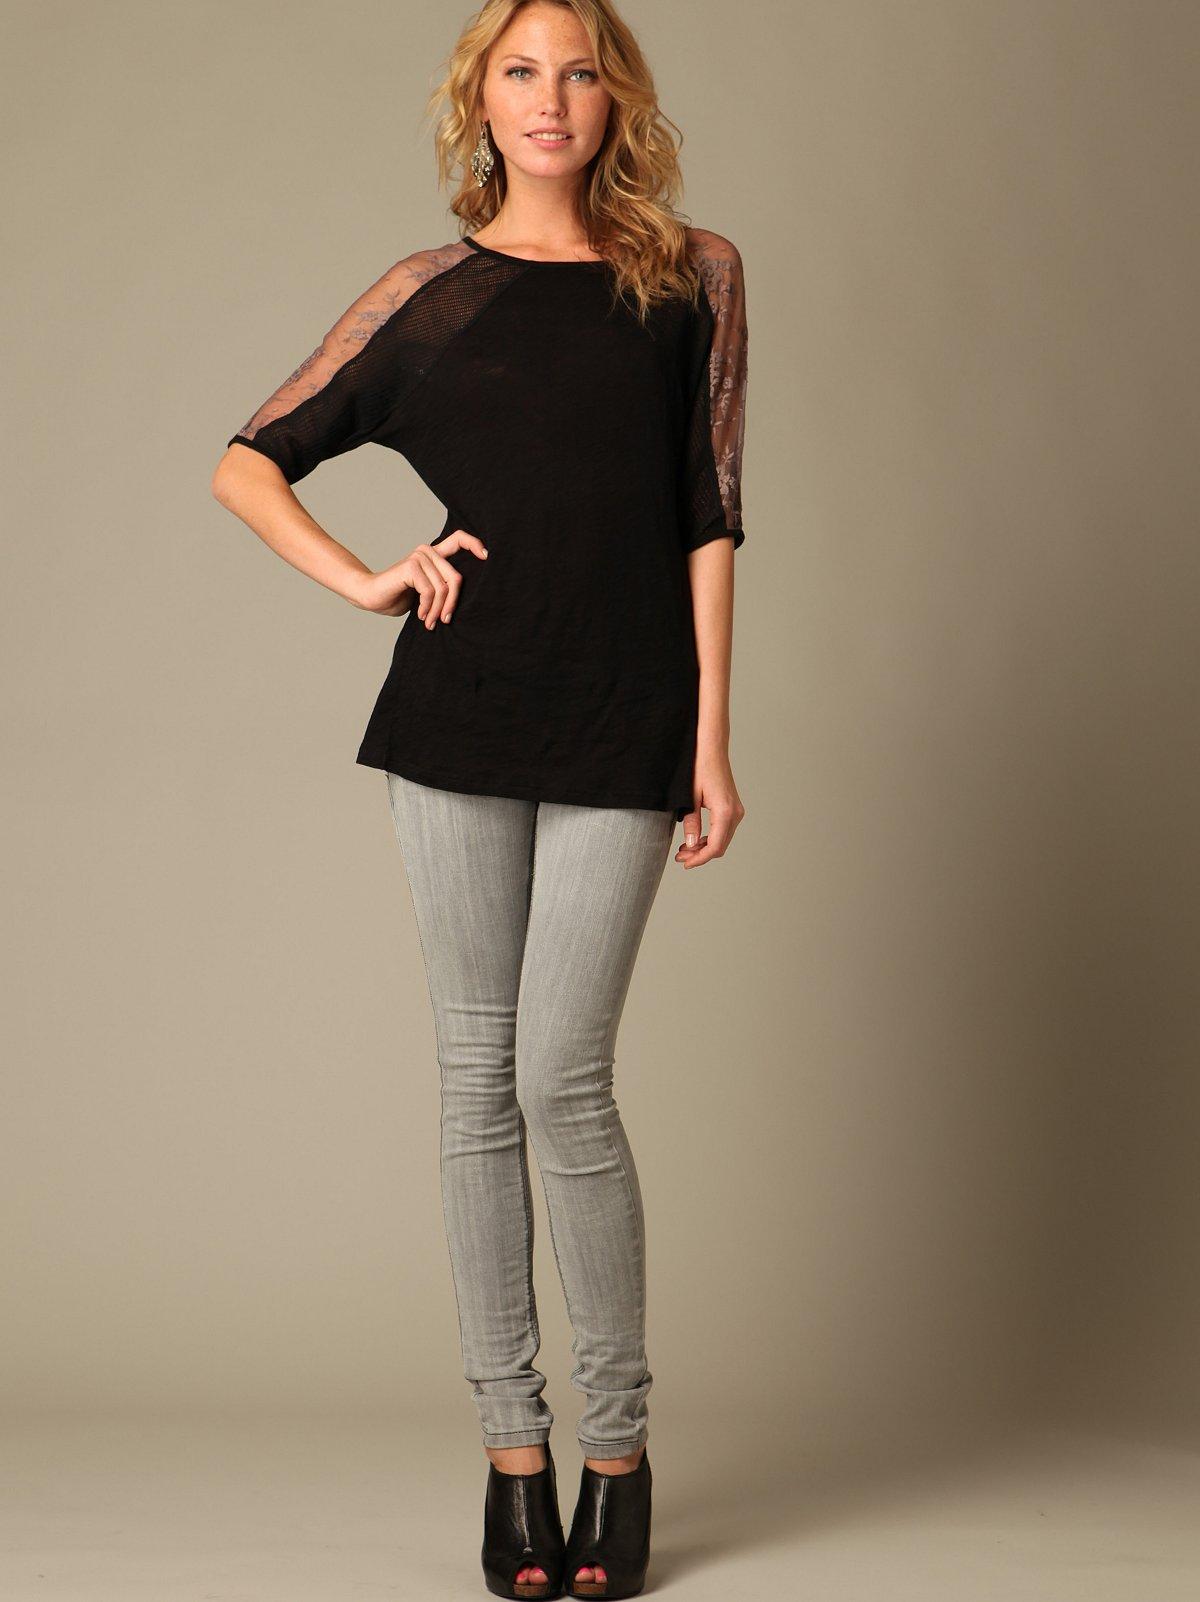 FP Super Skinny Jeans